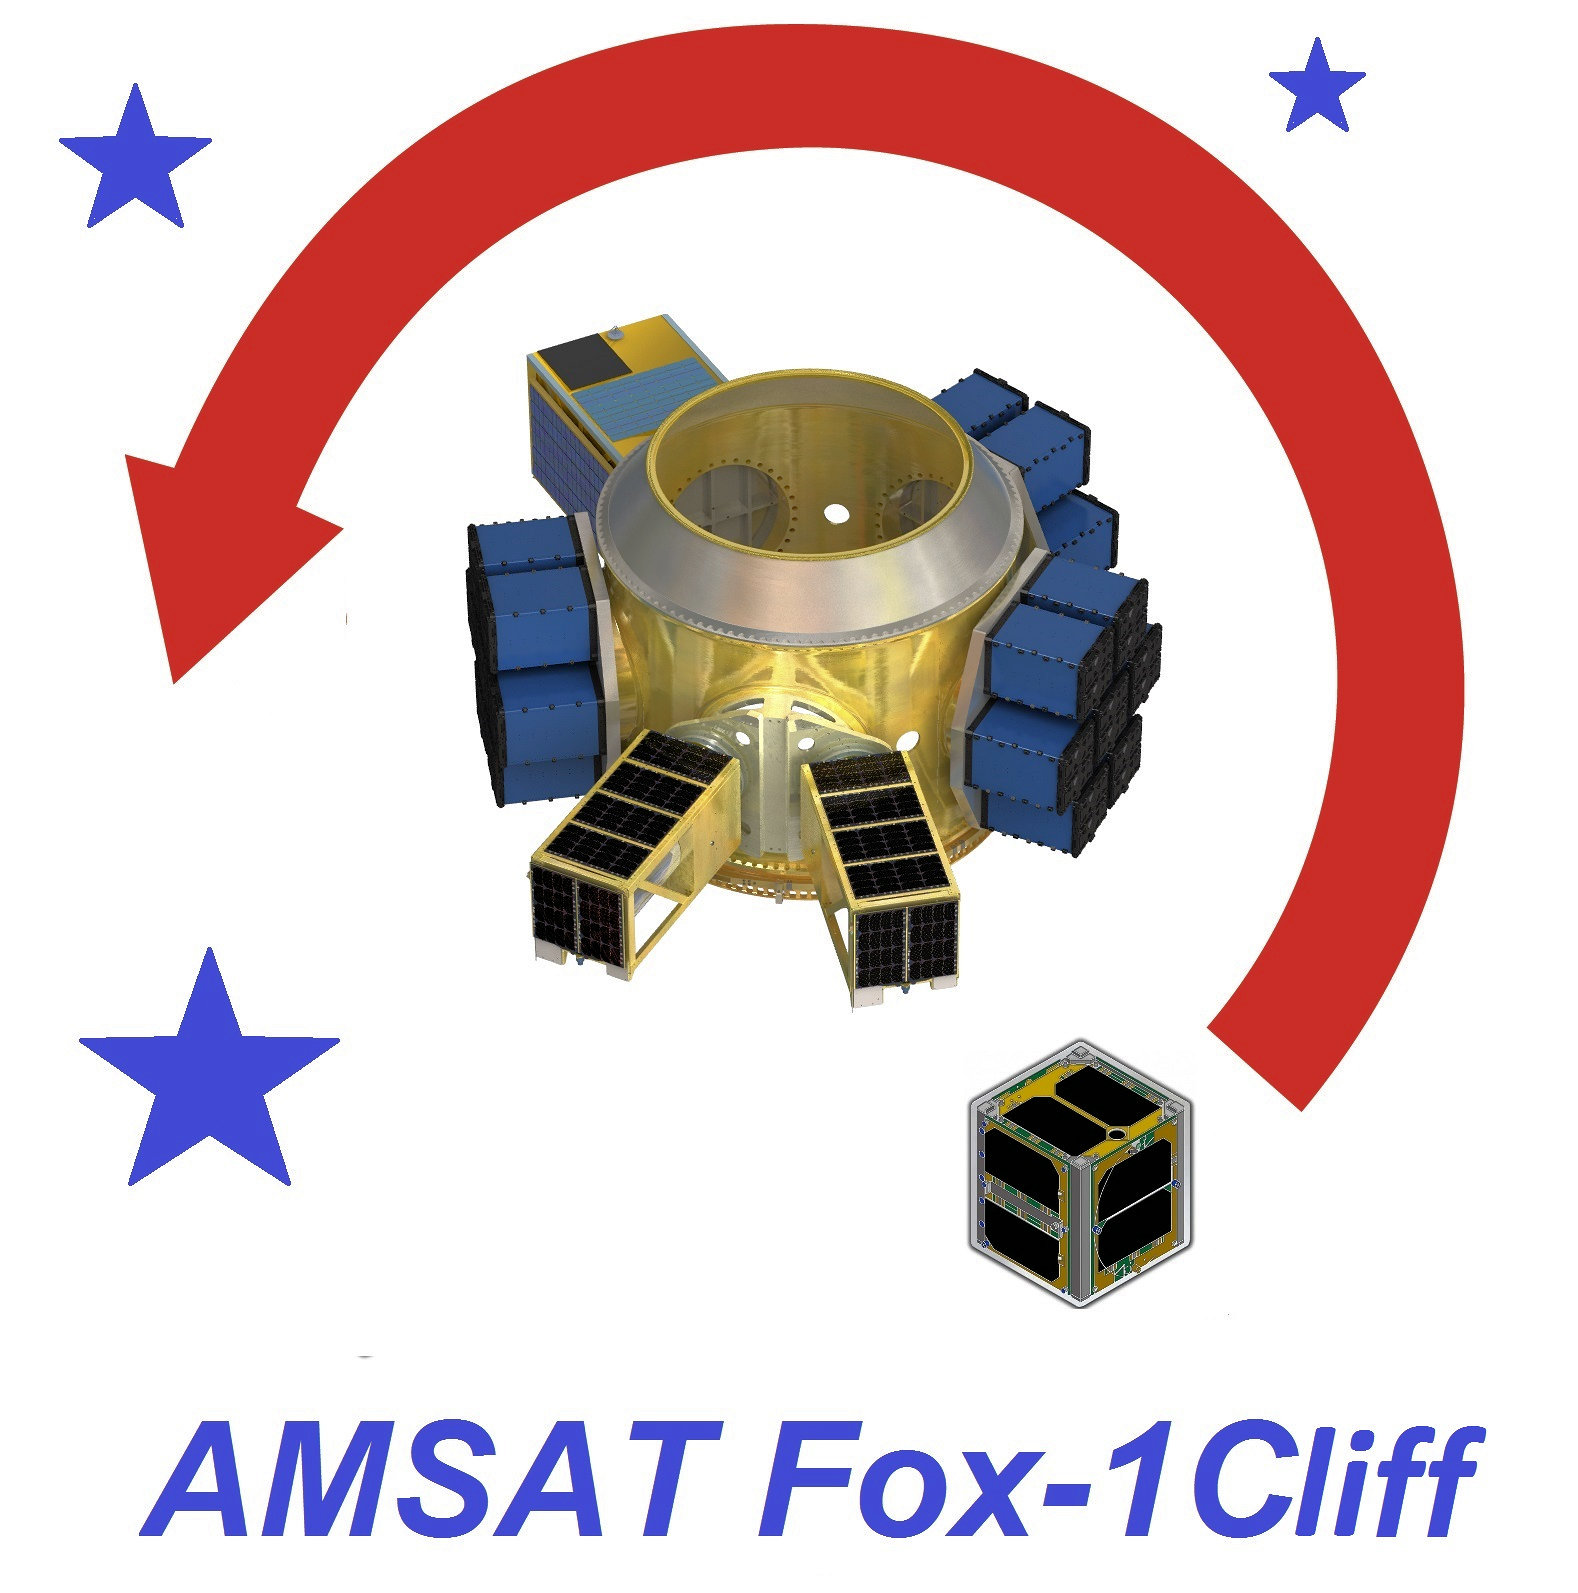 AMSAT's Fox-1Cliff CubeSat Ready for Launch